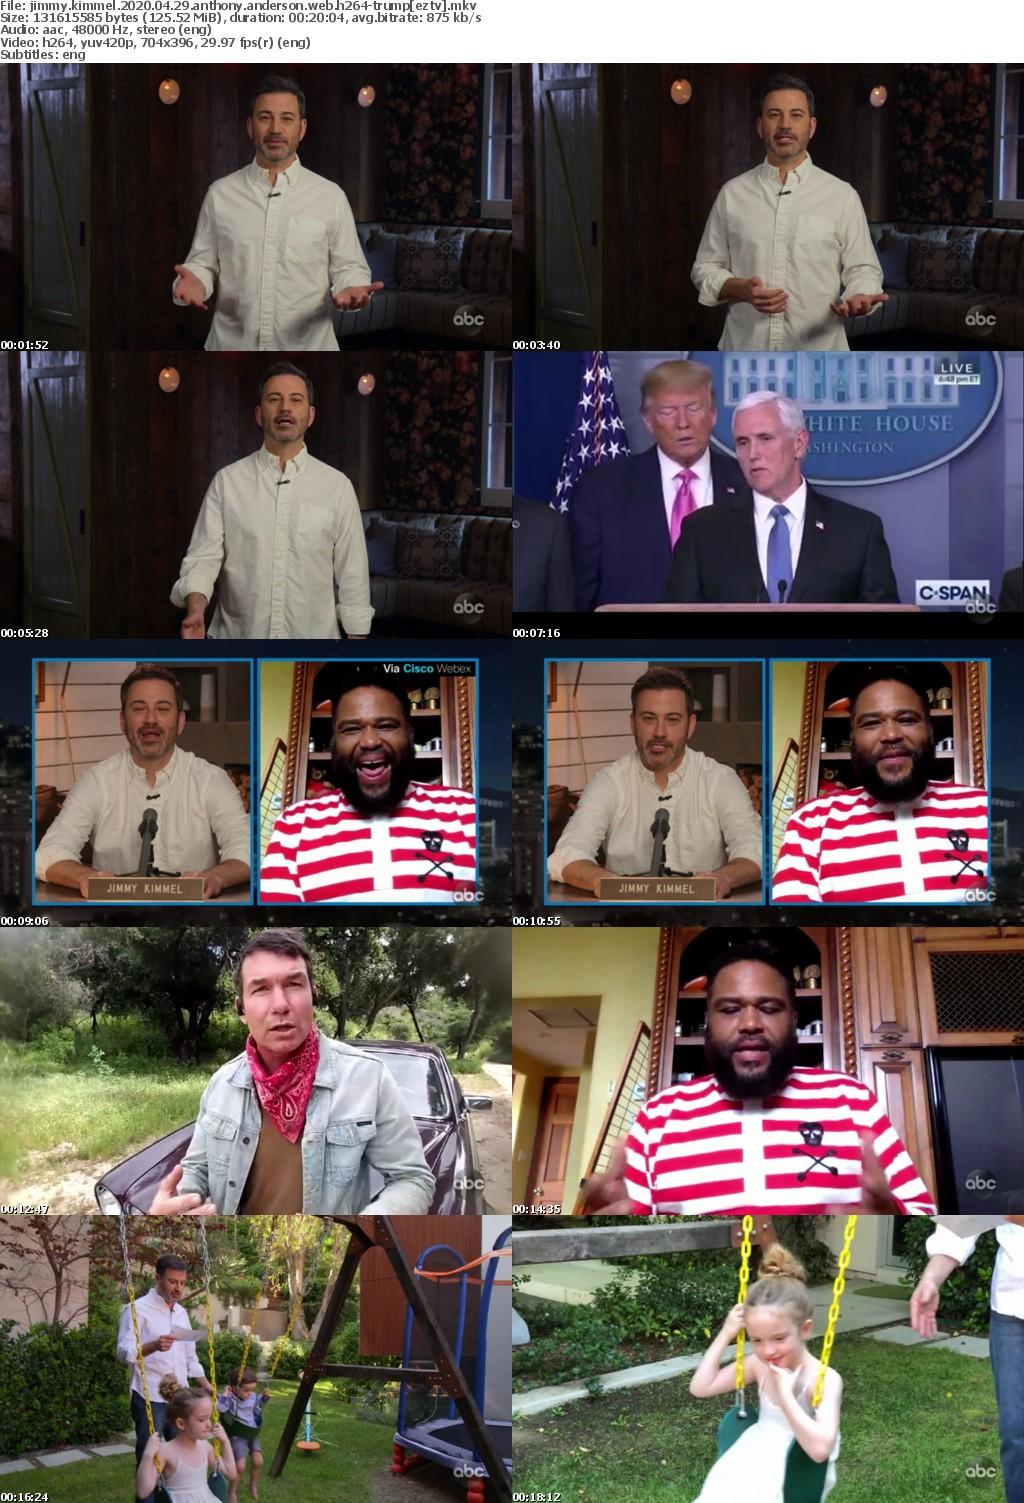 Jimmy Kimmel 2020 04 29 Anthony Anderson WEB h264-TRUMP